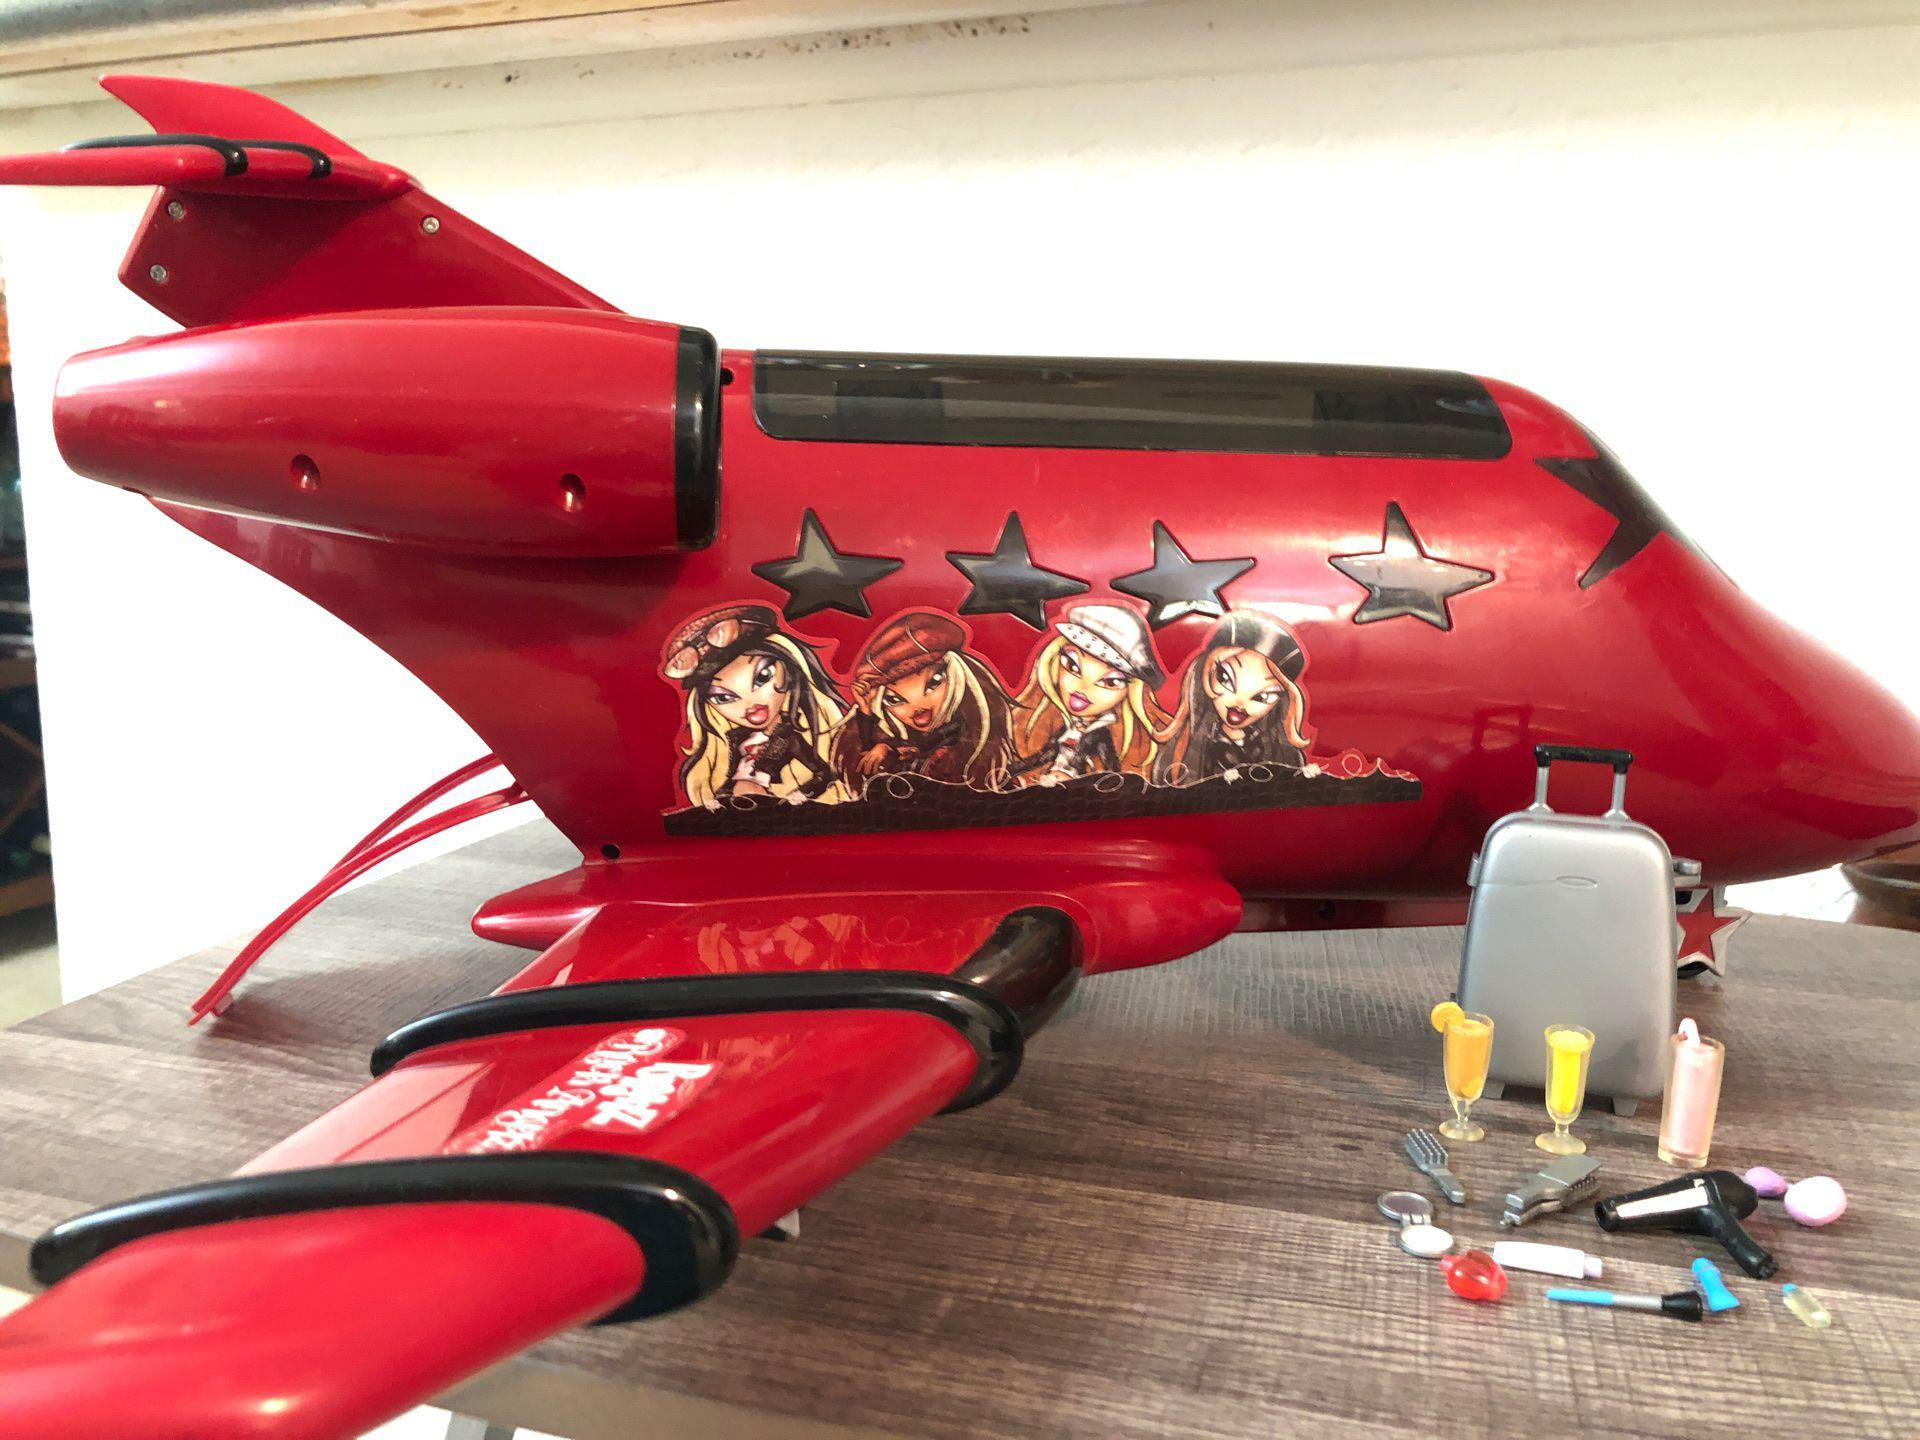 Bratz Rock Angelz Jet plane